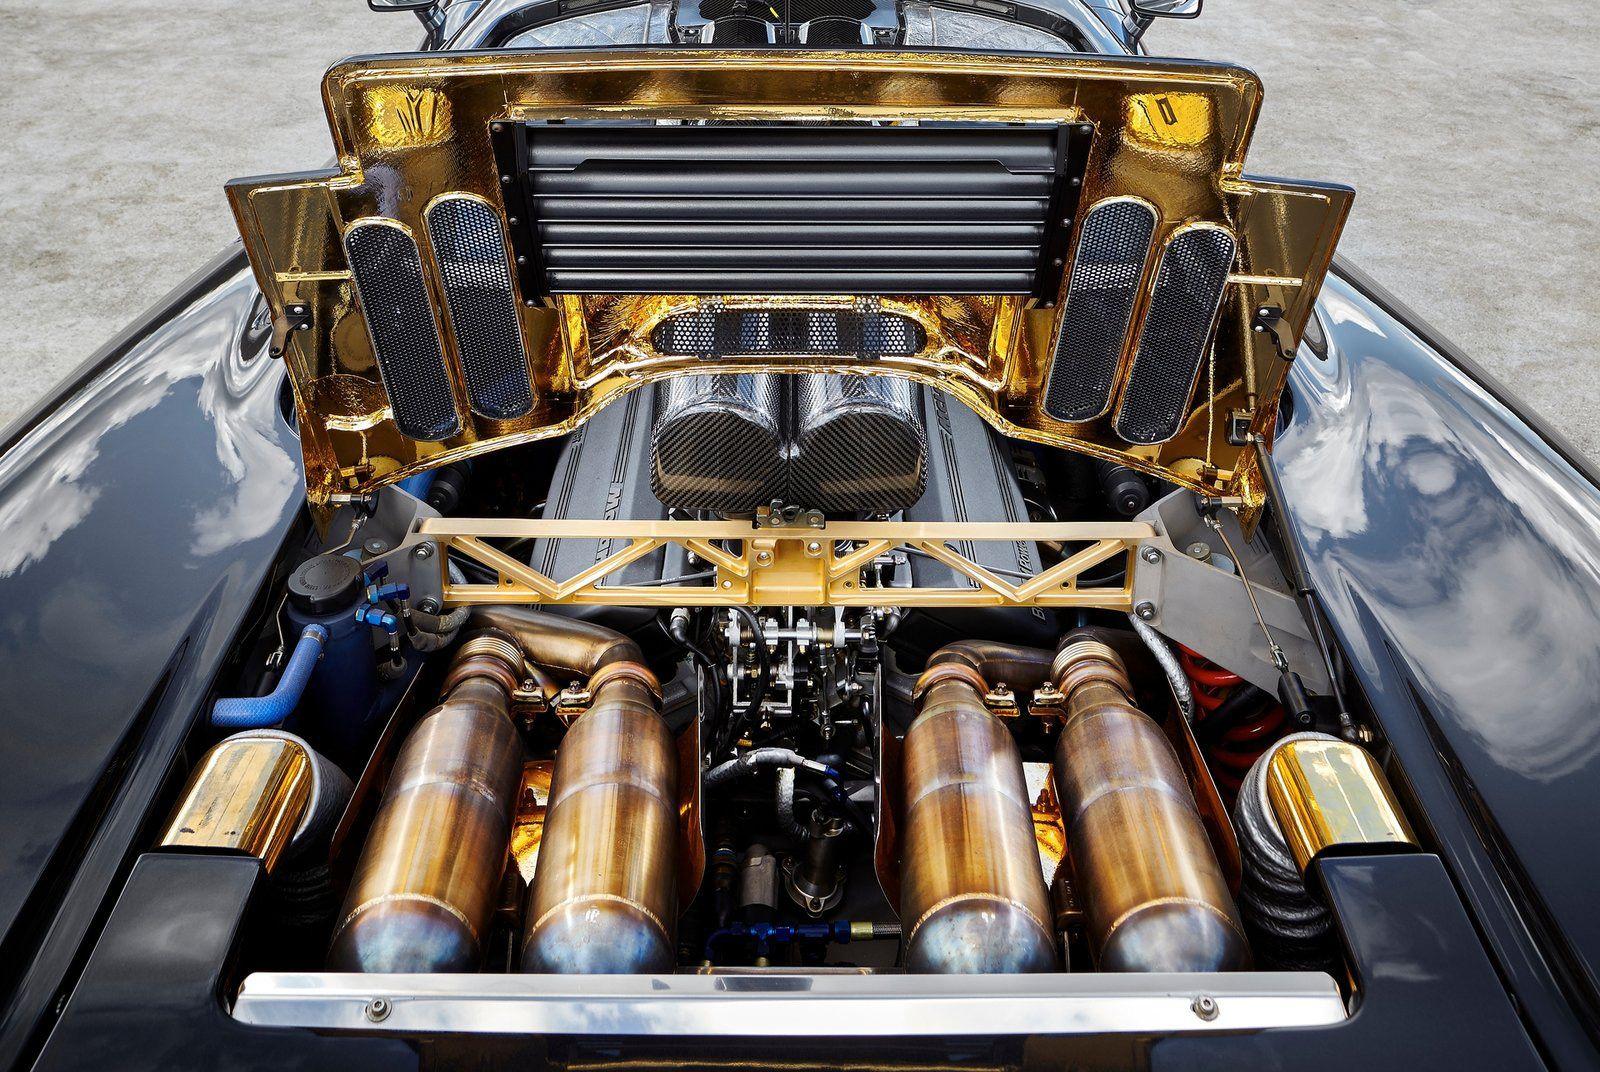 Mclaren F1-Gear-Patrol-Slide-06